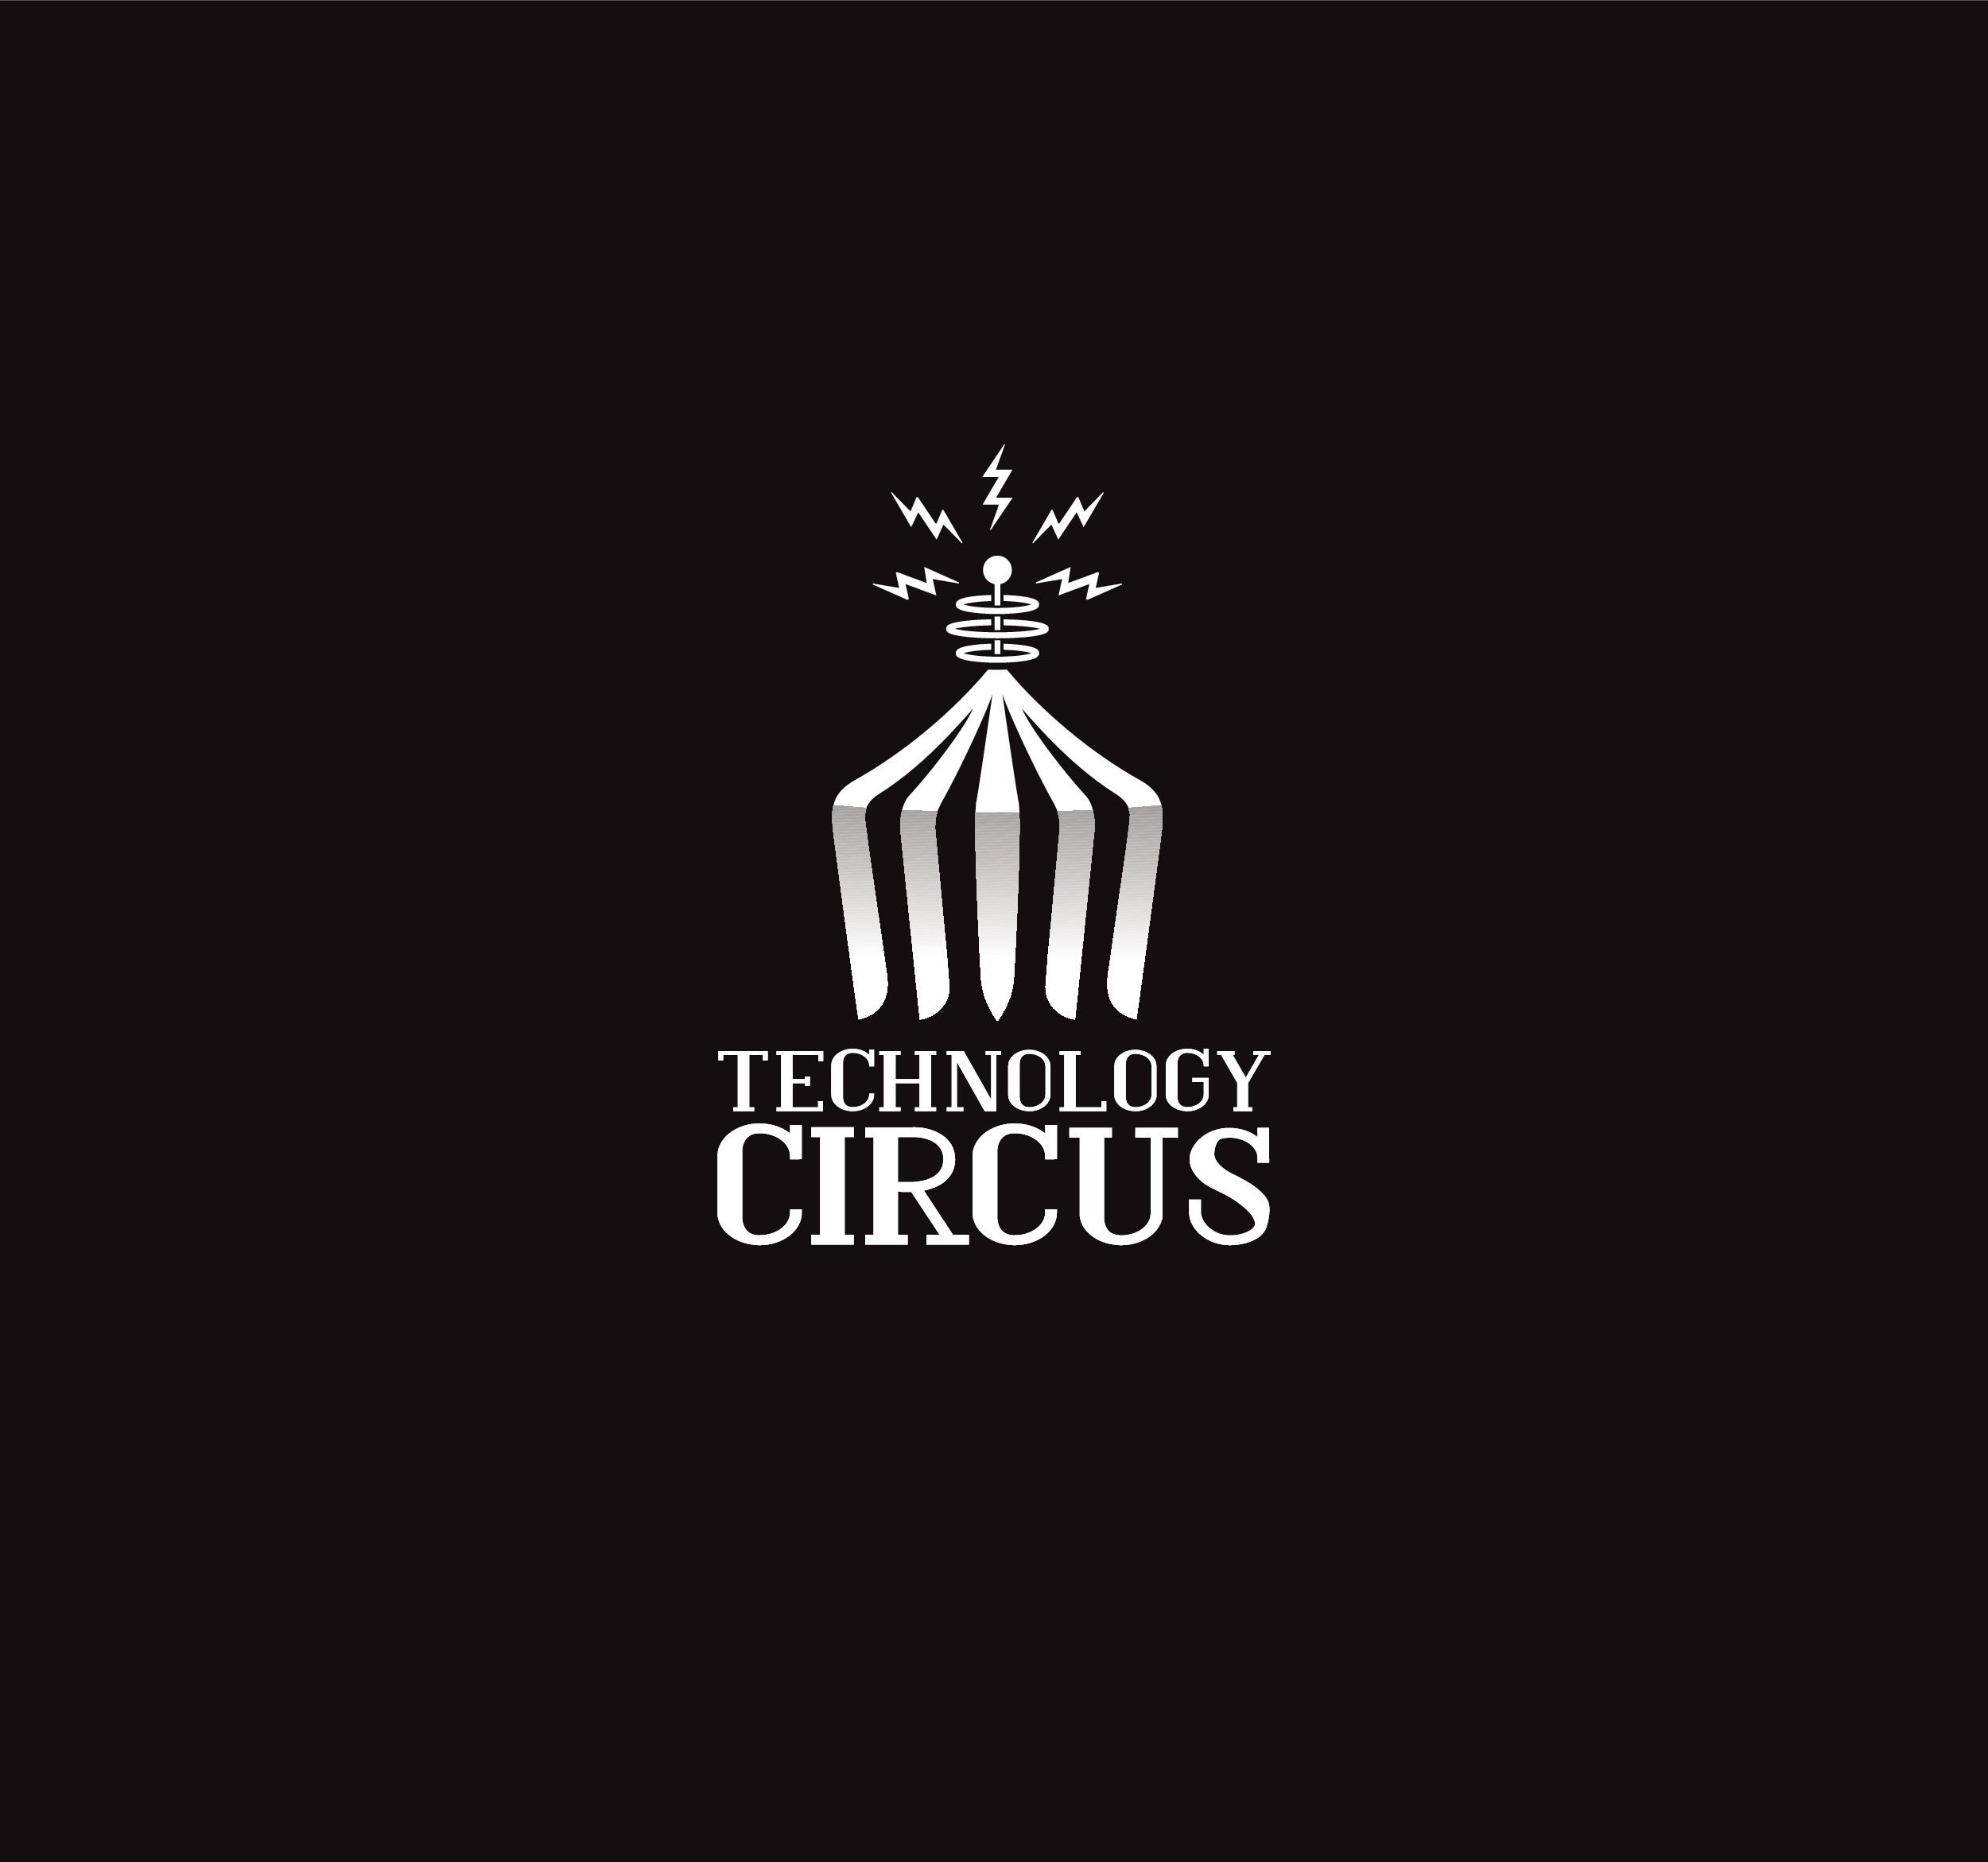 Create a logo for Technology Circus